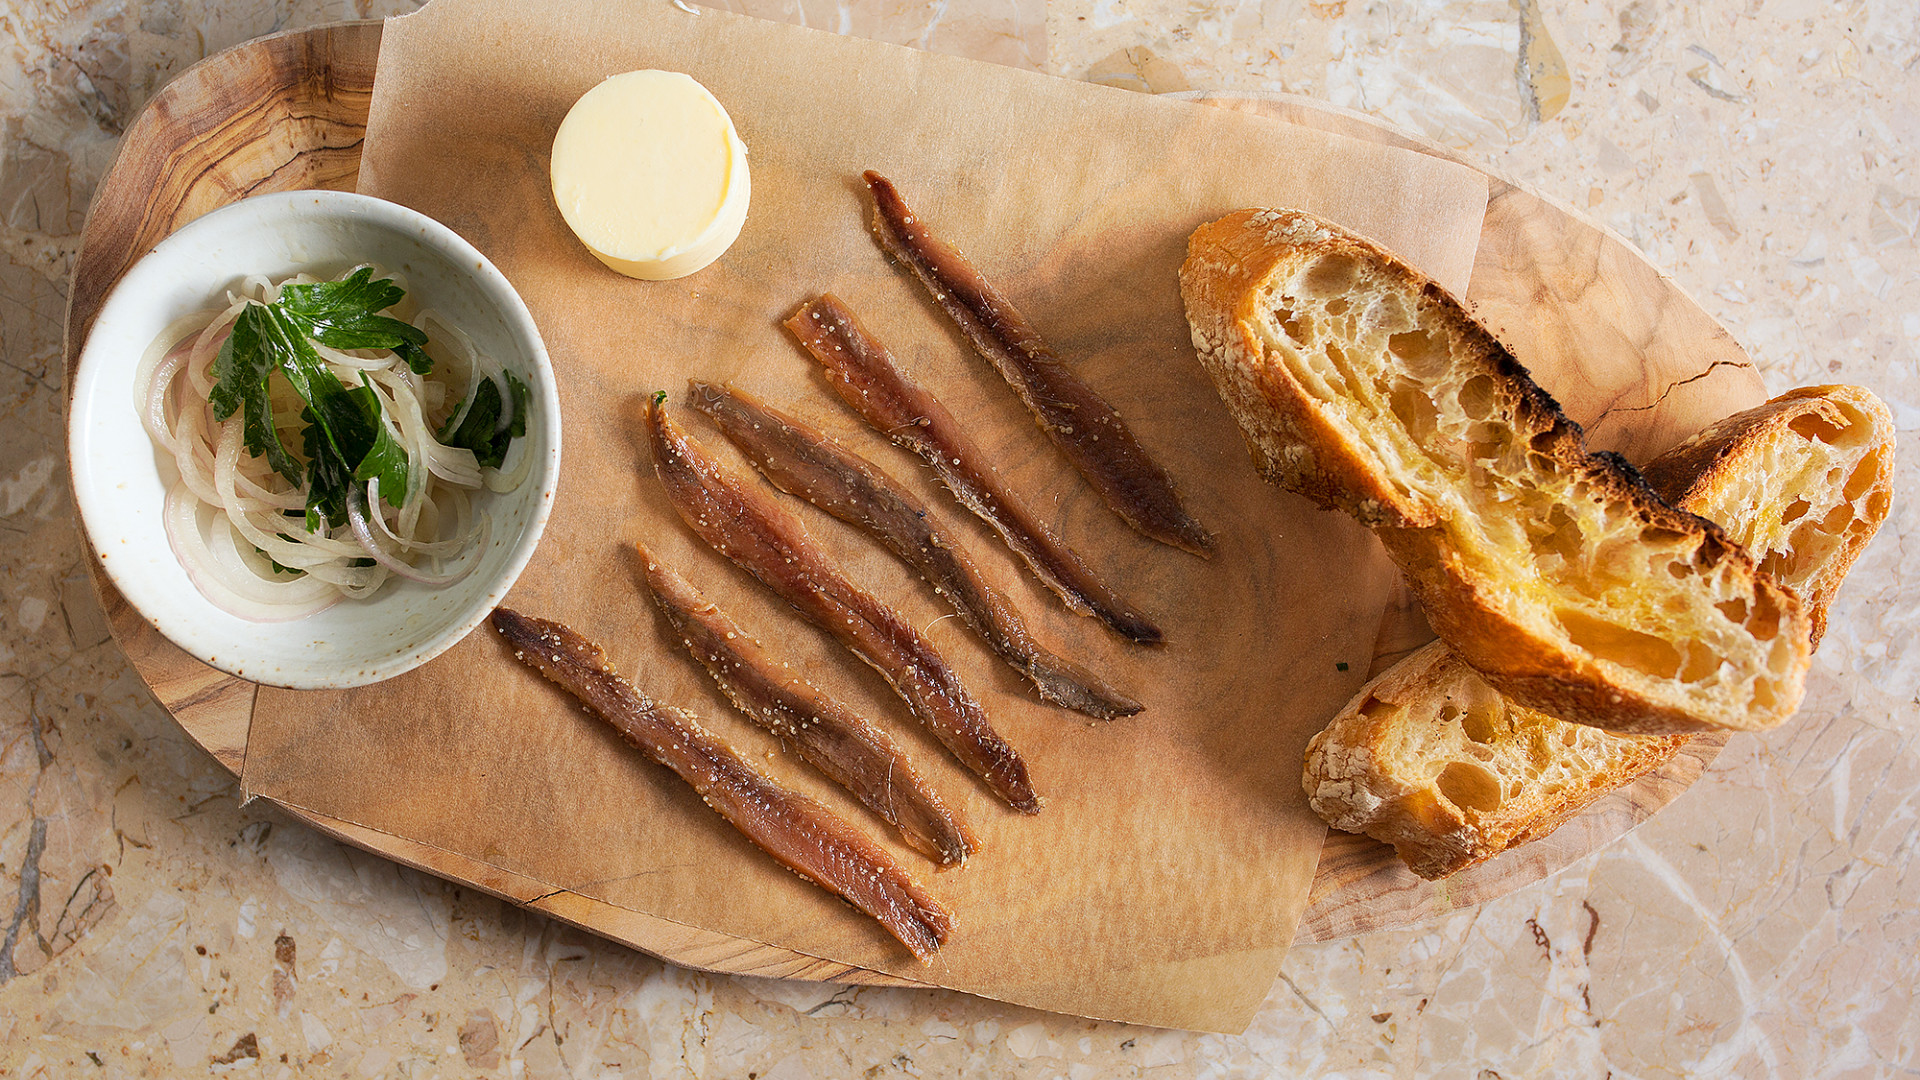 Anchovies and toast at Rambla in Soho